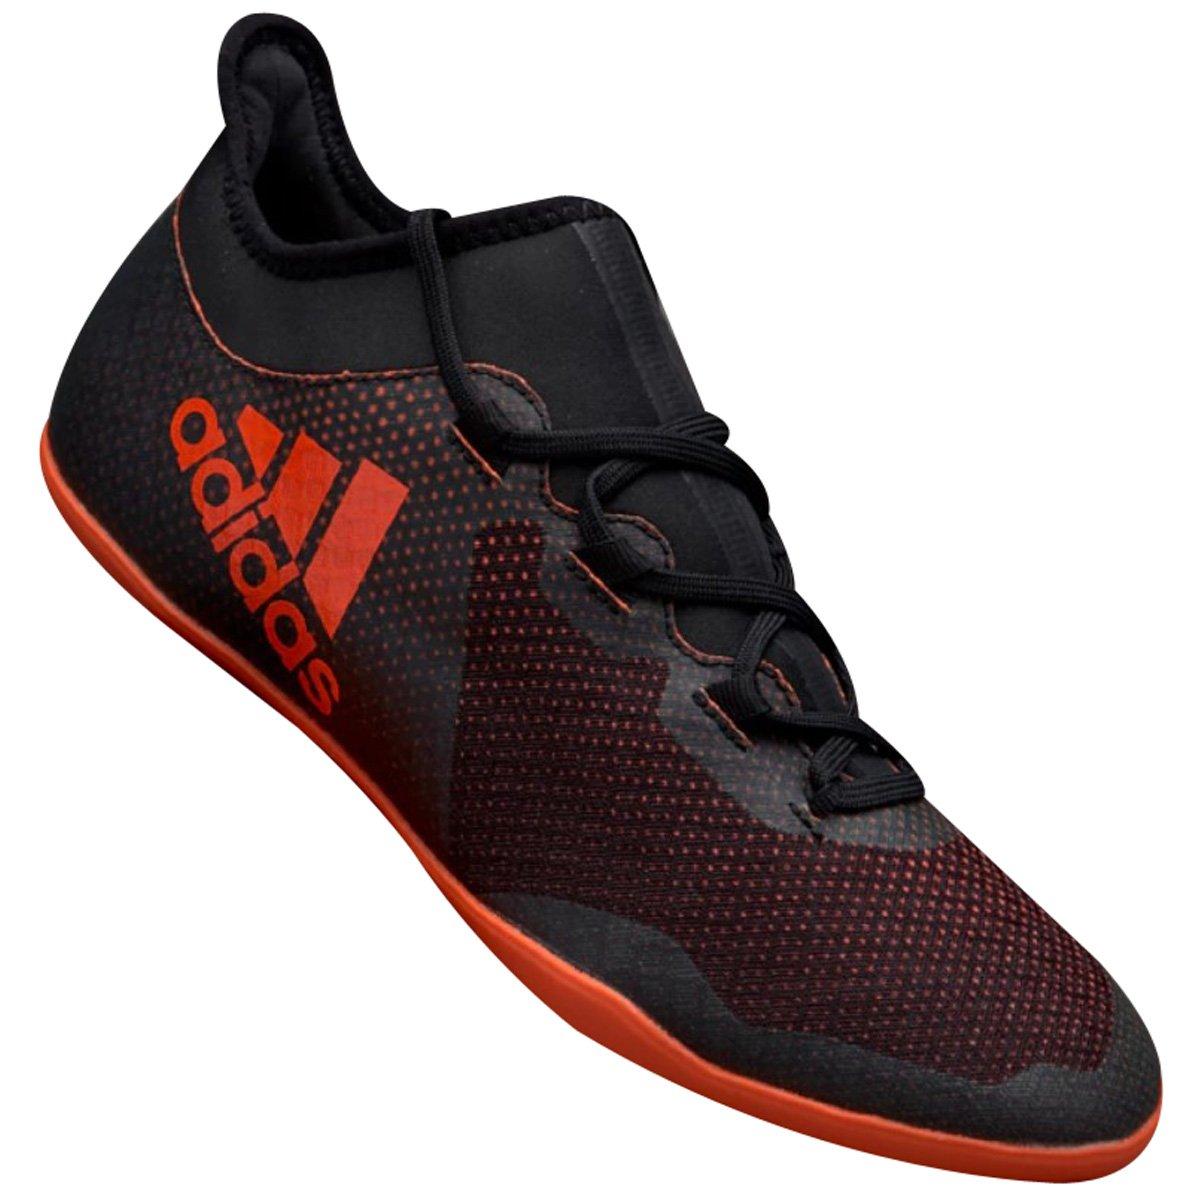 d9e91b453 Indoor Masculino Adidas X Tango 17.3 CG3718 Laranja Preto